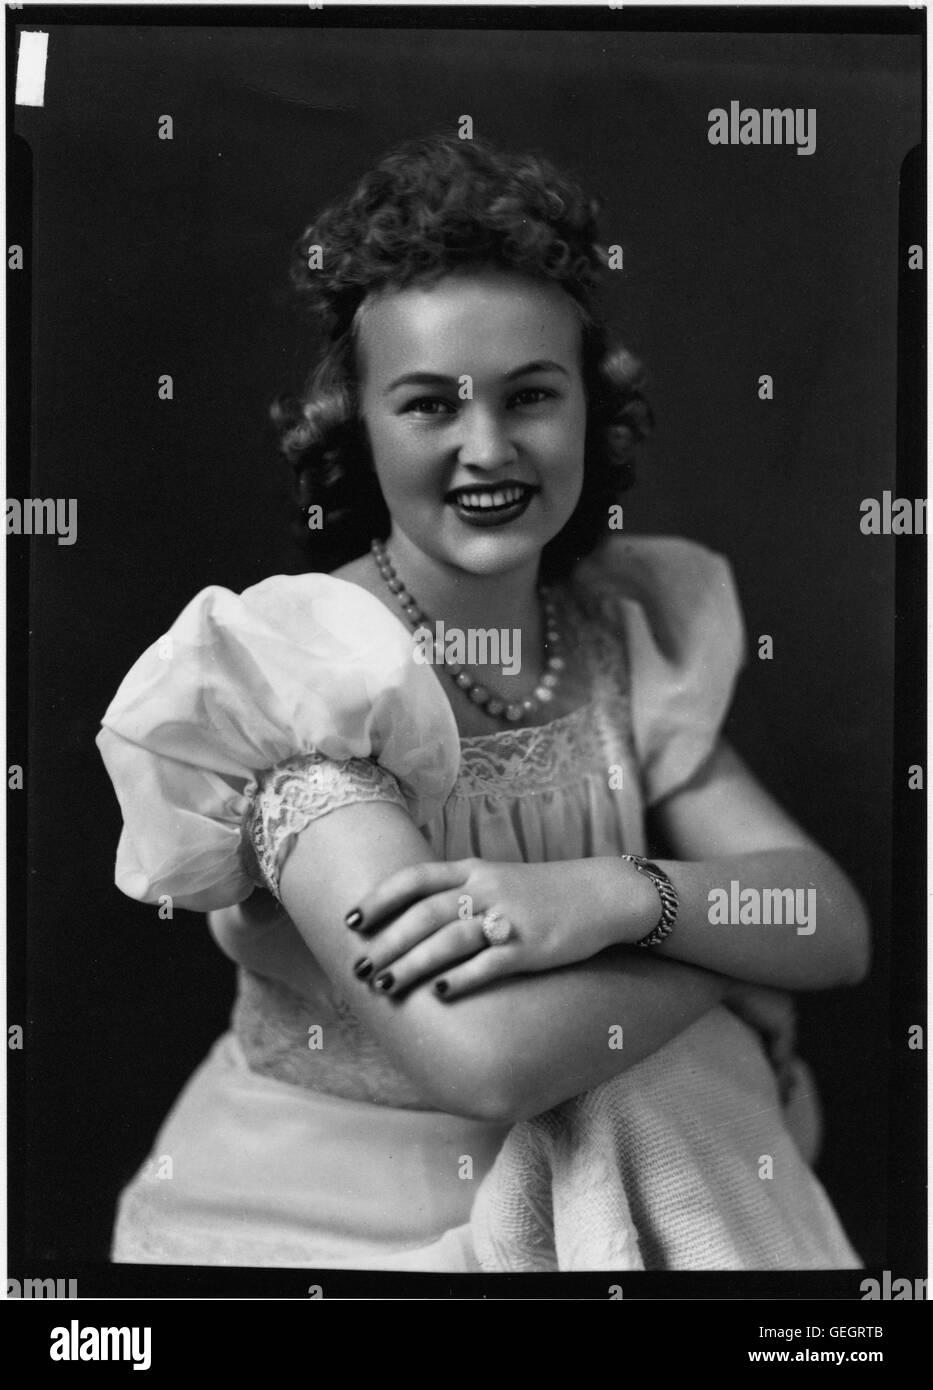 Portrait photograph of unidentified woman - Stock Image